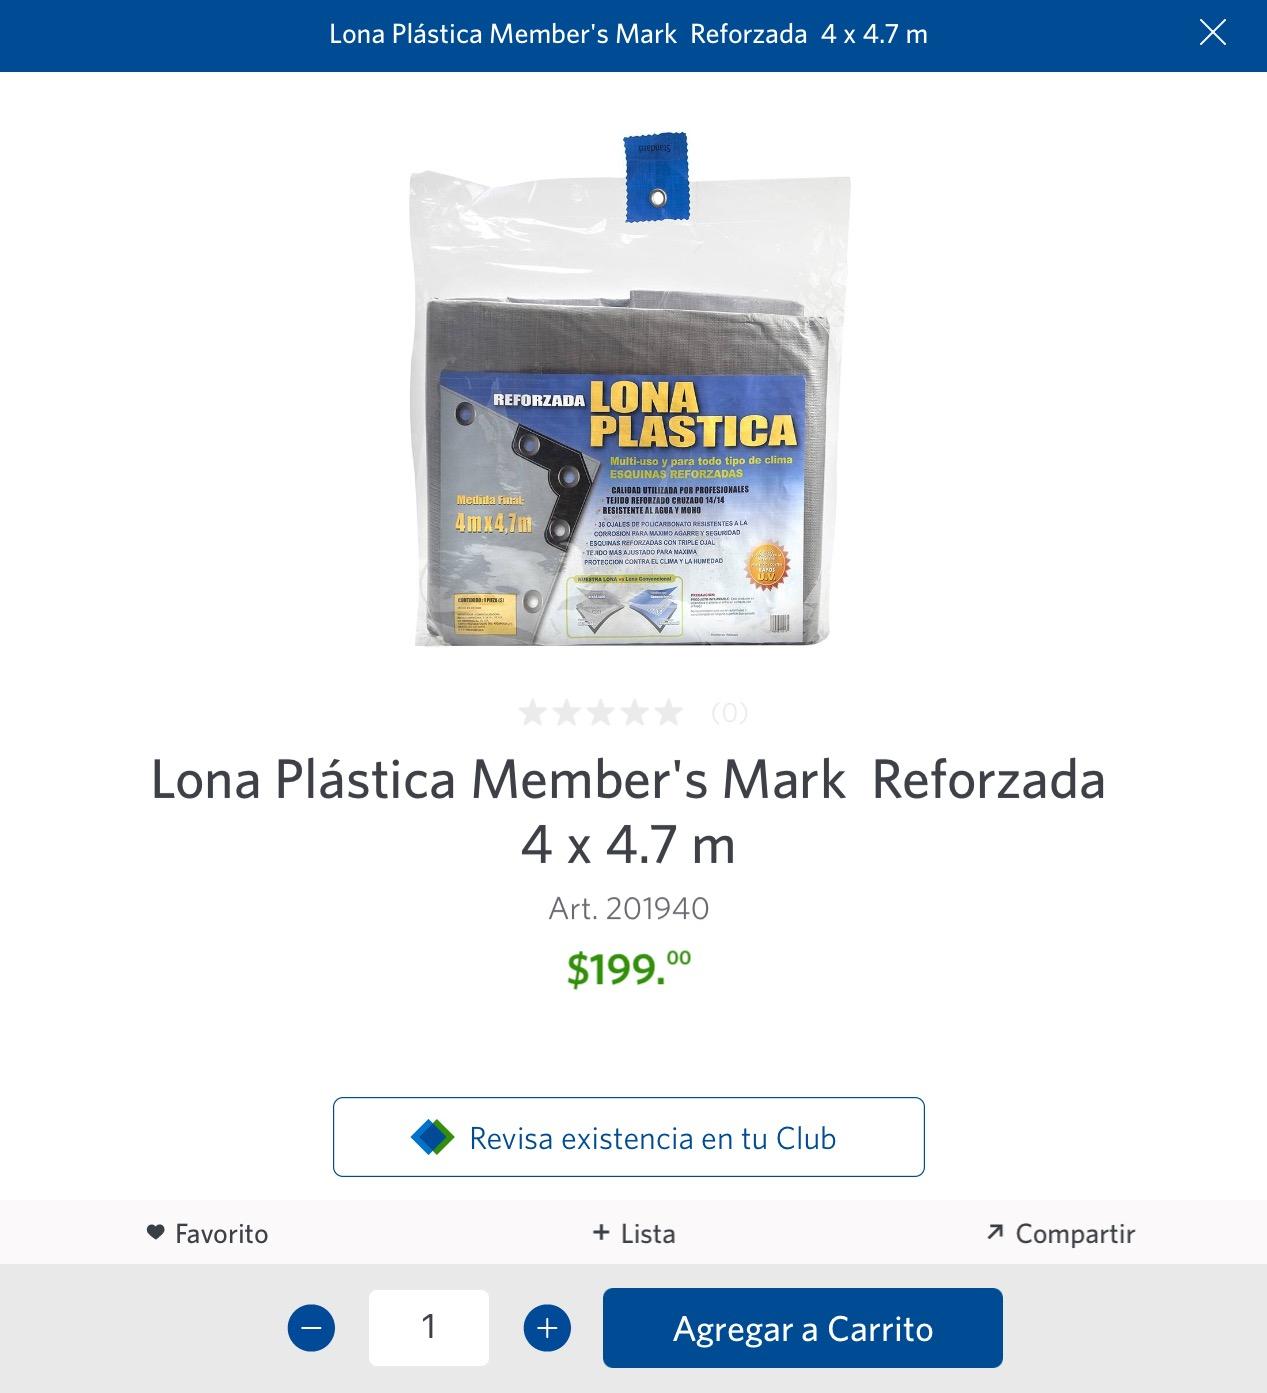 Sam's Club: Lona plástica 4x4.7m. Member's Mark